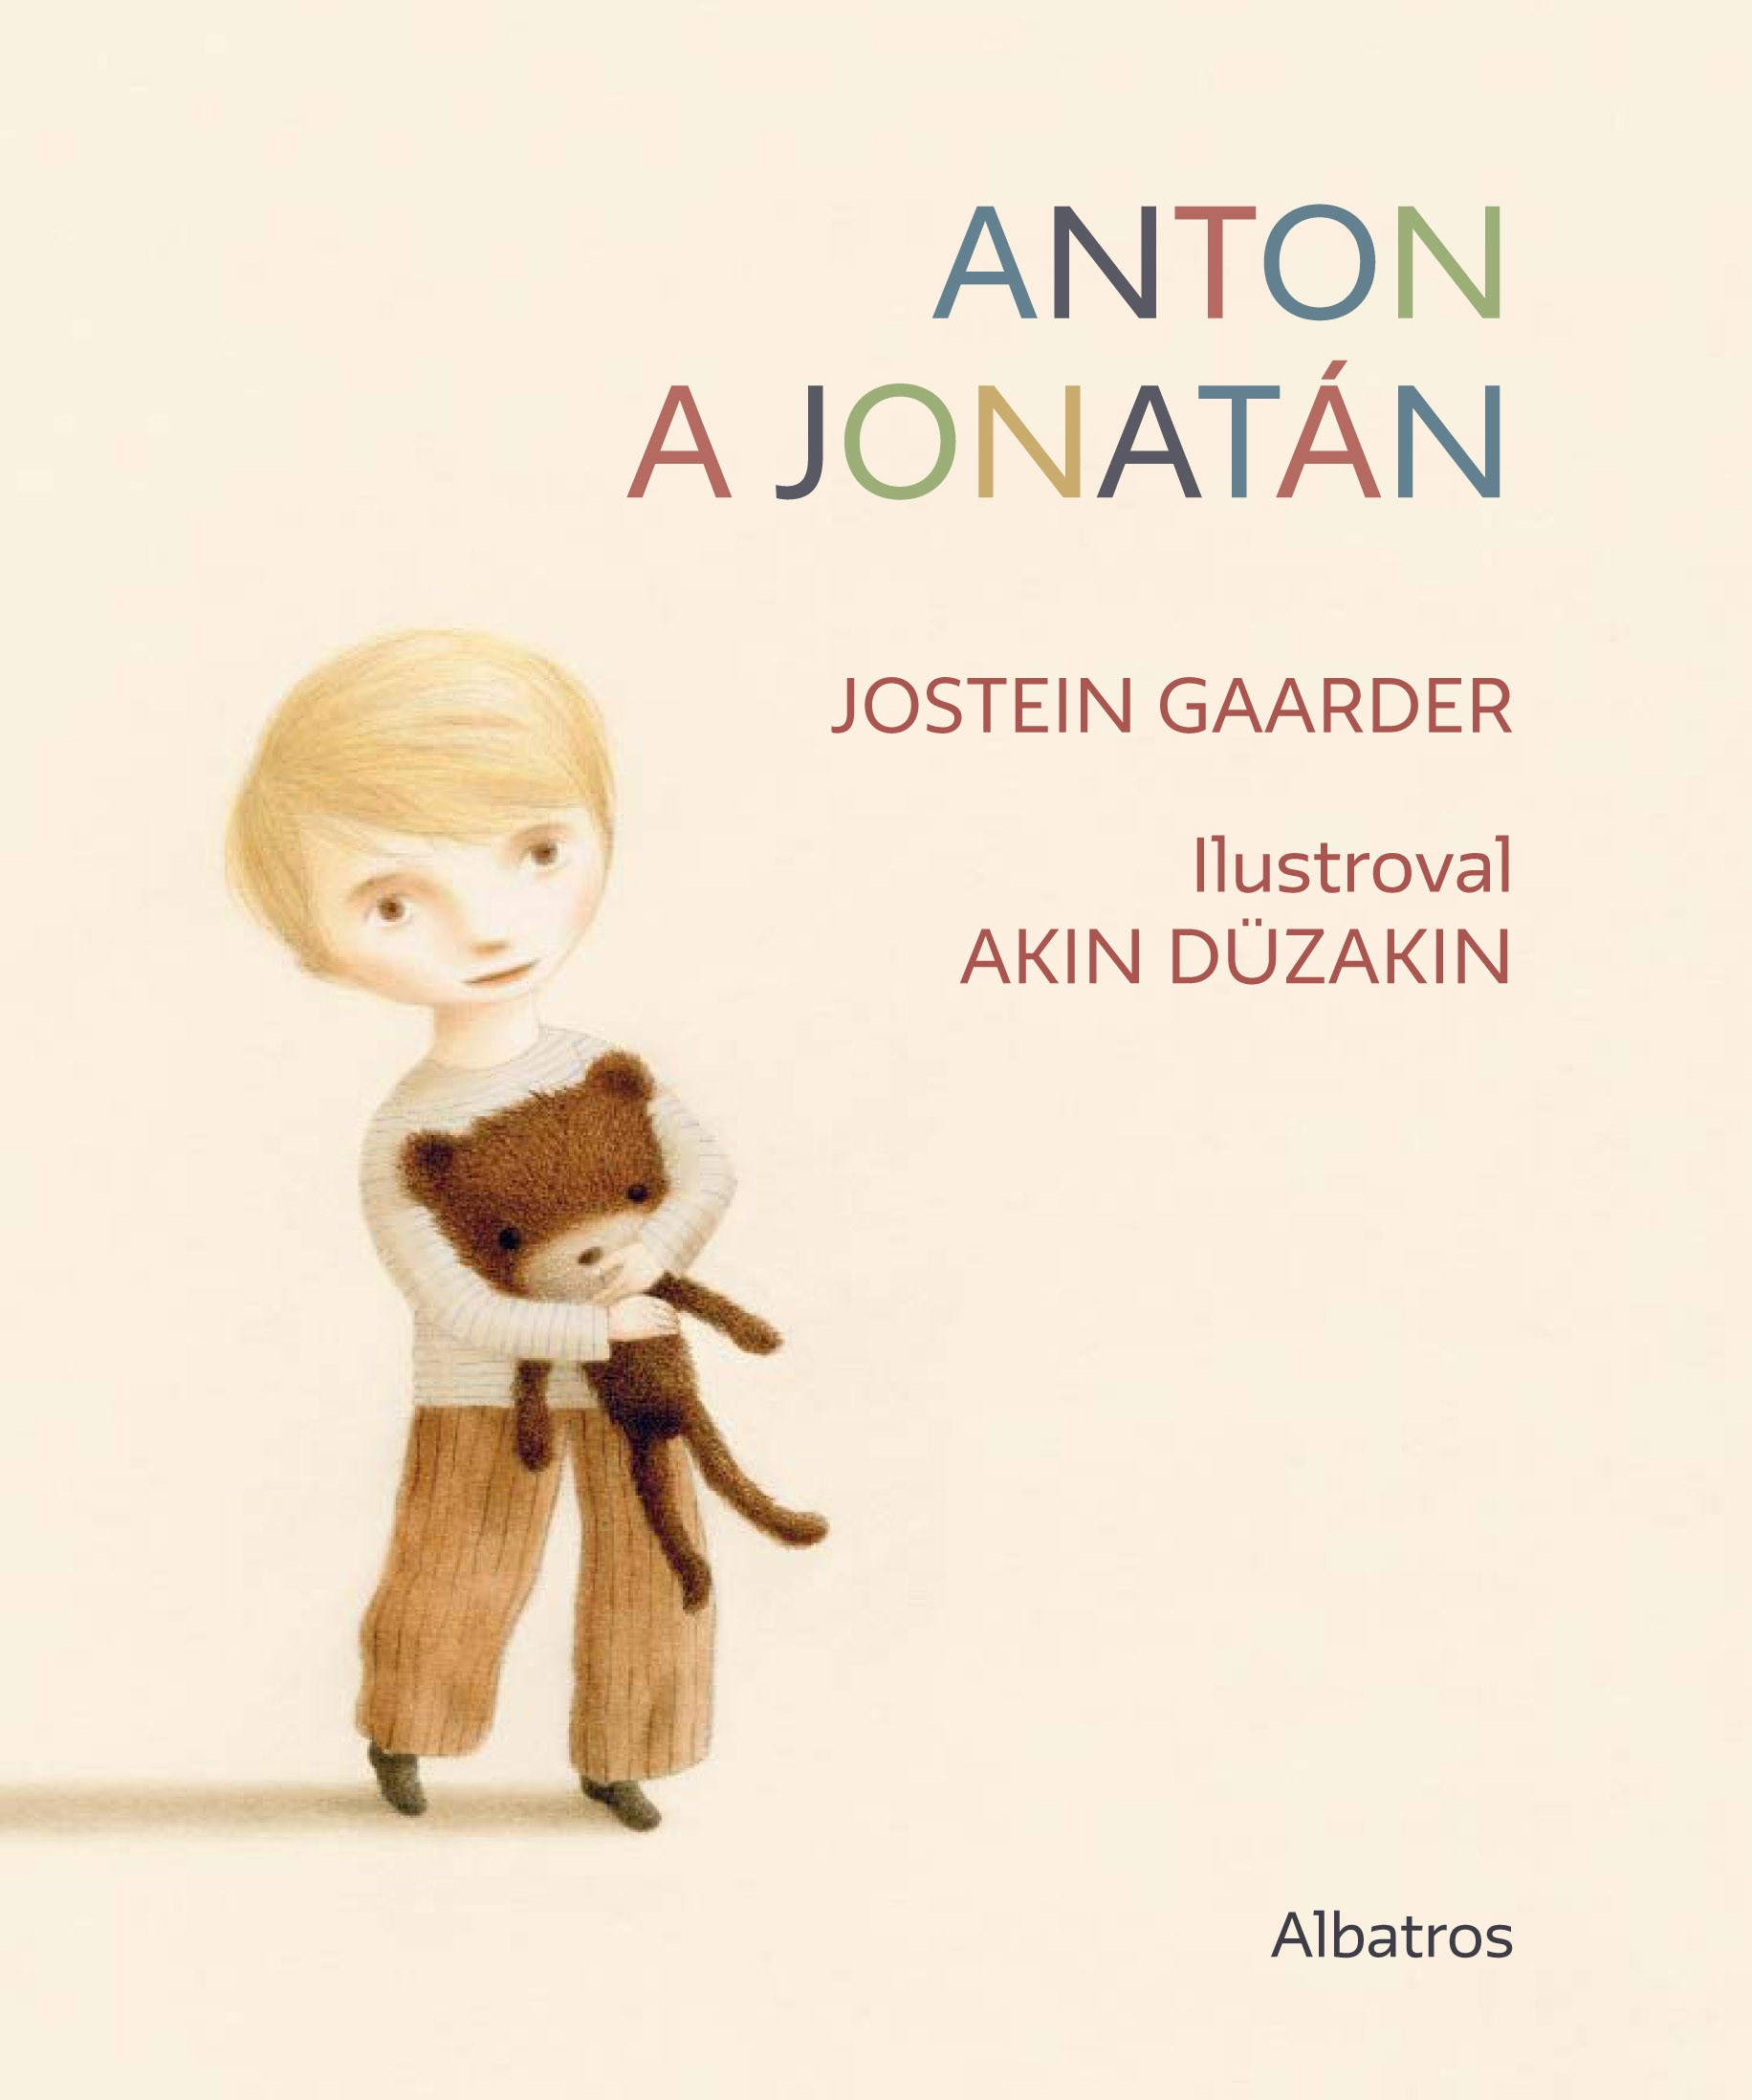 Anton a Jonatán | Jostein Gaarder, Akin Düzakin